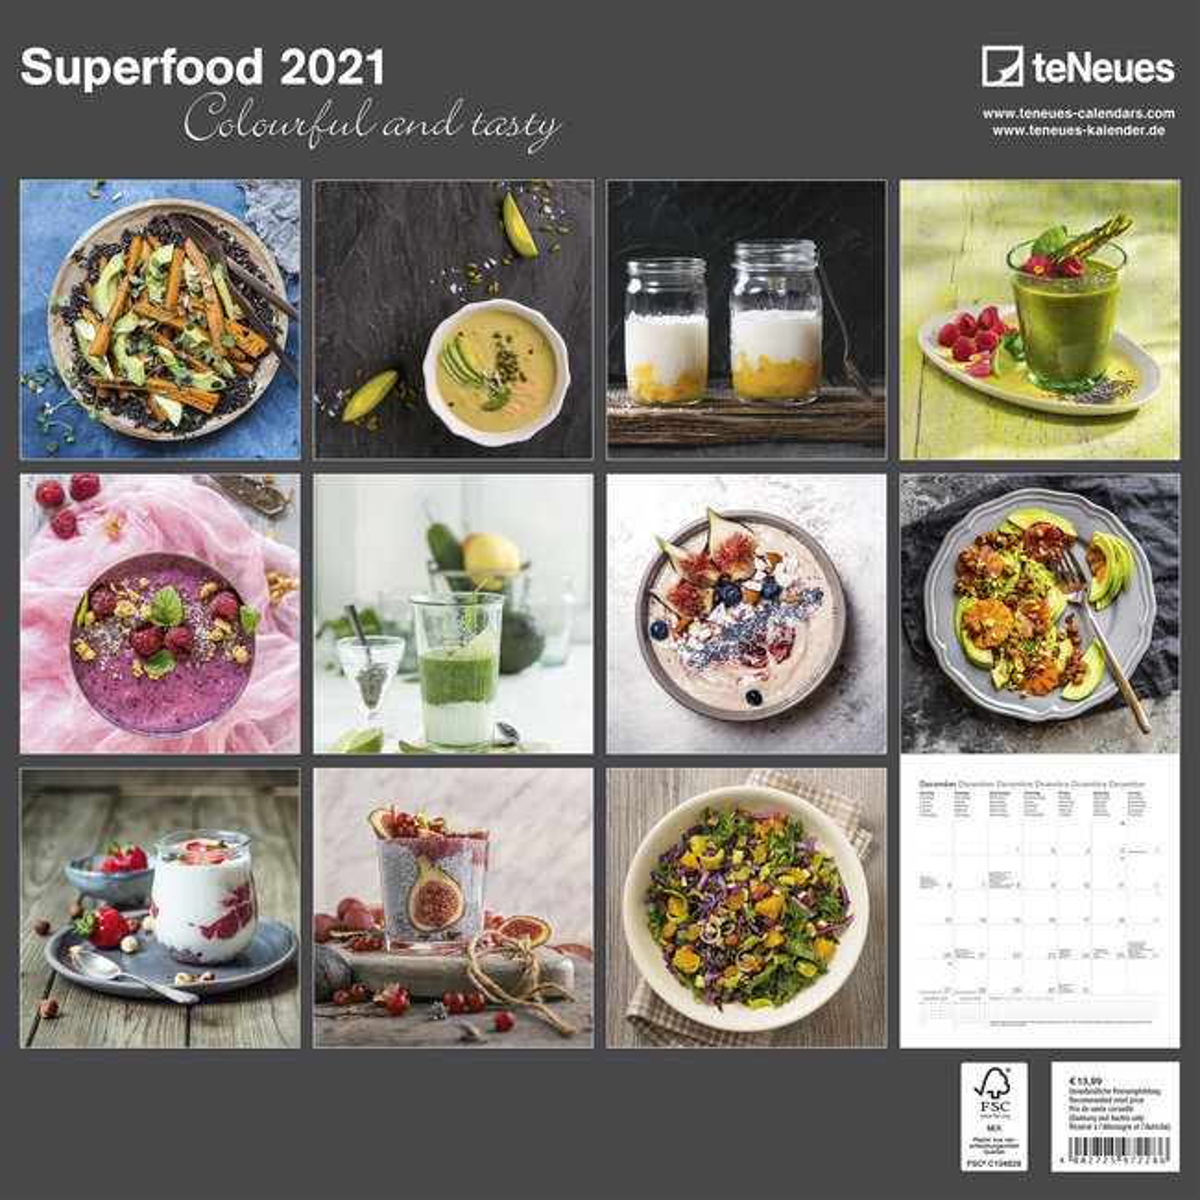 Calendrier 2021 Cuisine saine healthy